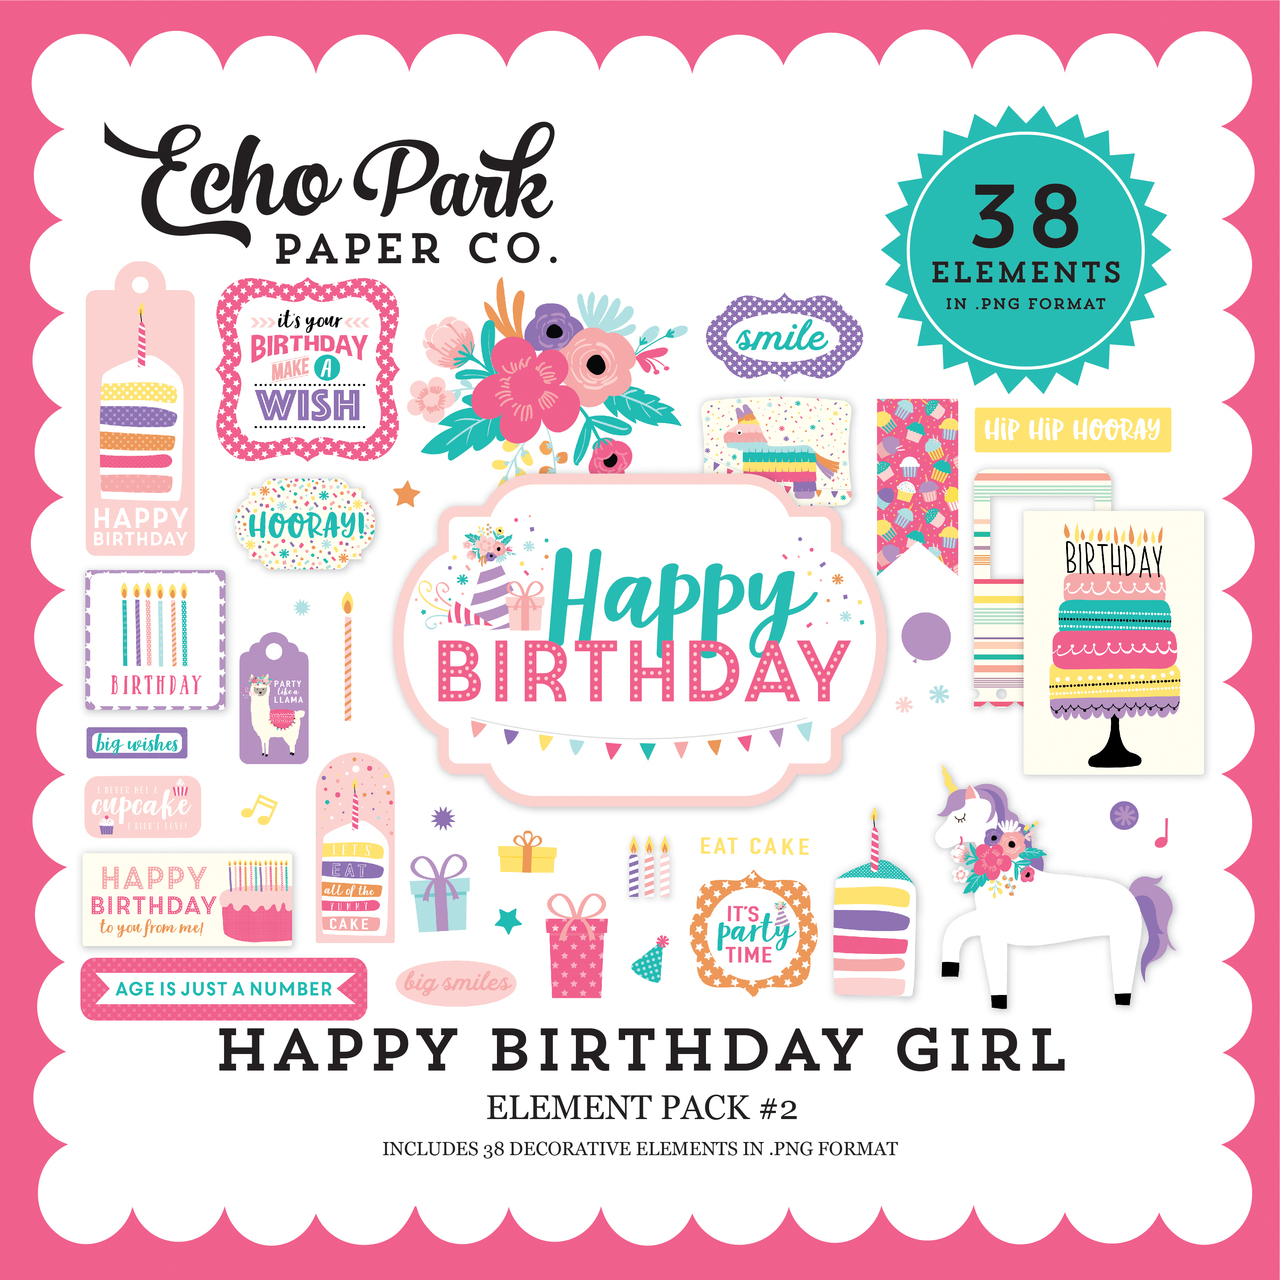 Happy Birthday Girl Element Pack #2